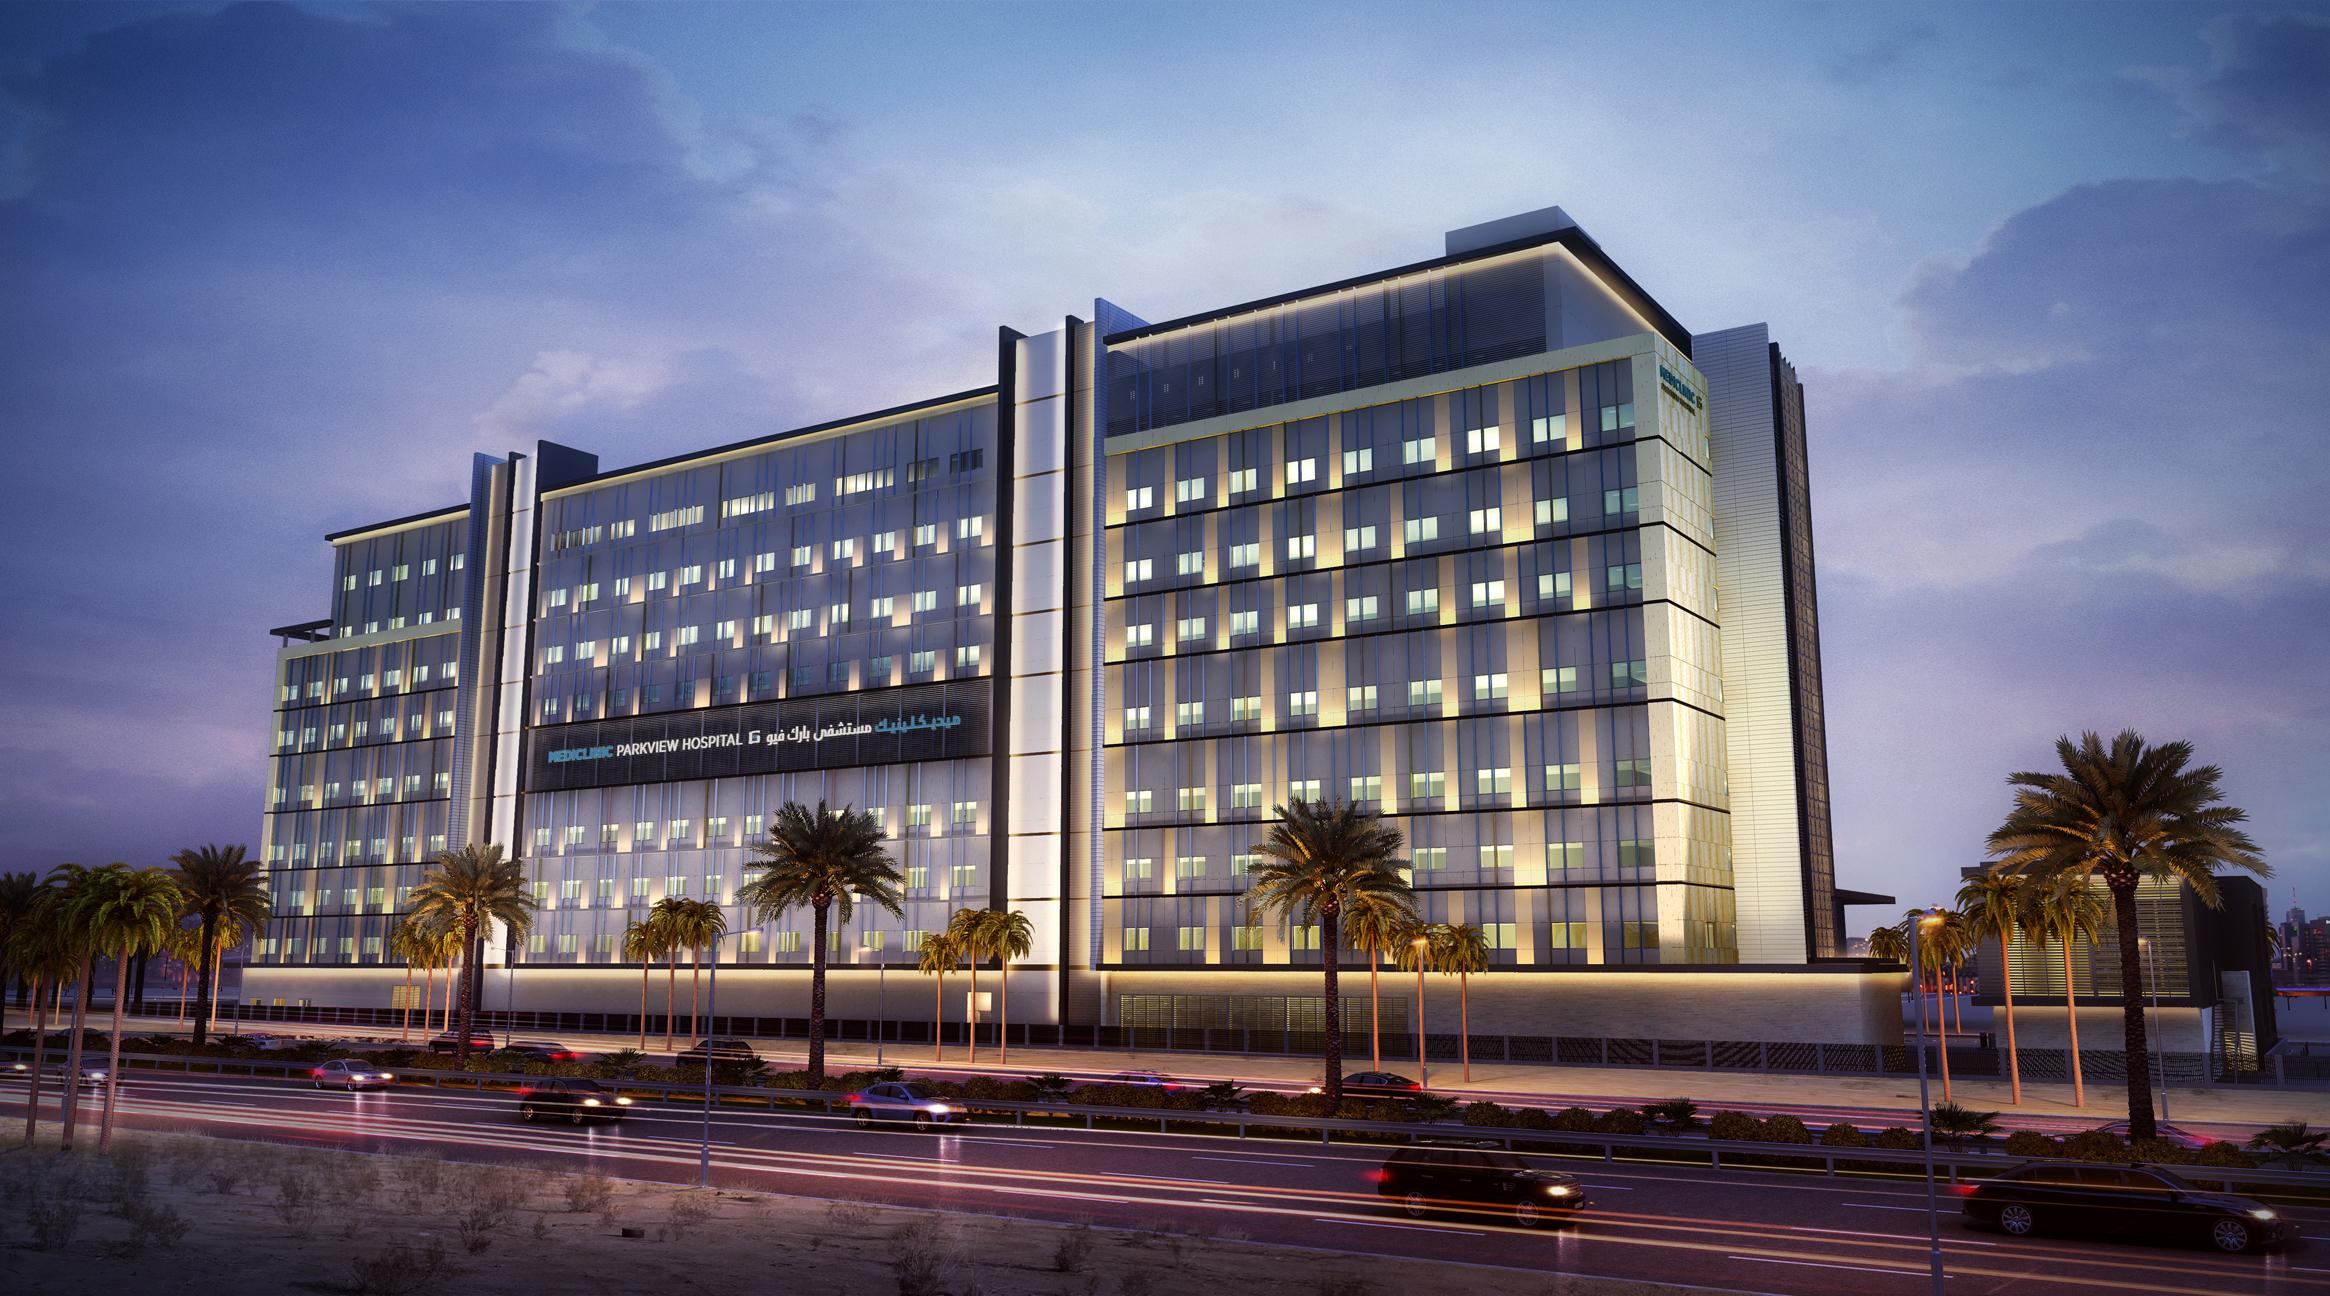 Mediclinic Parkview Hospital, Dubai, UAE